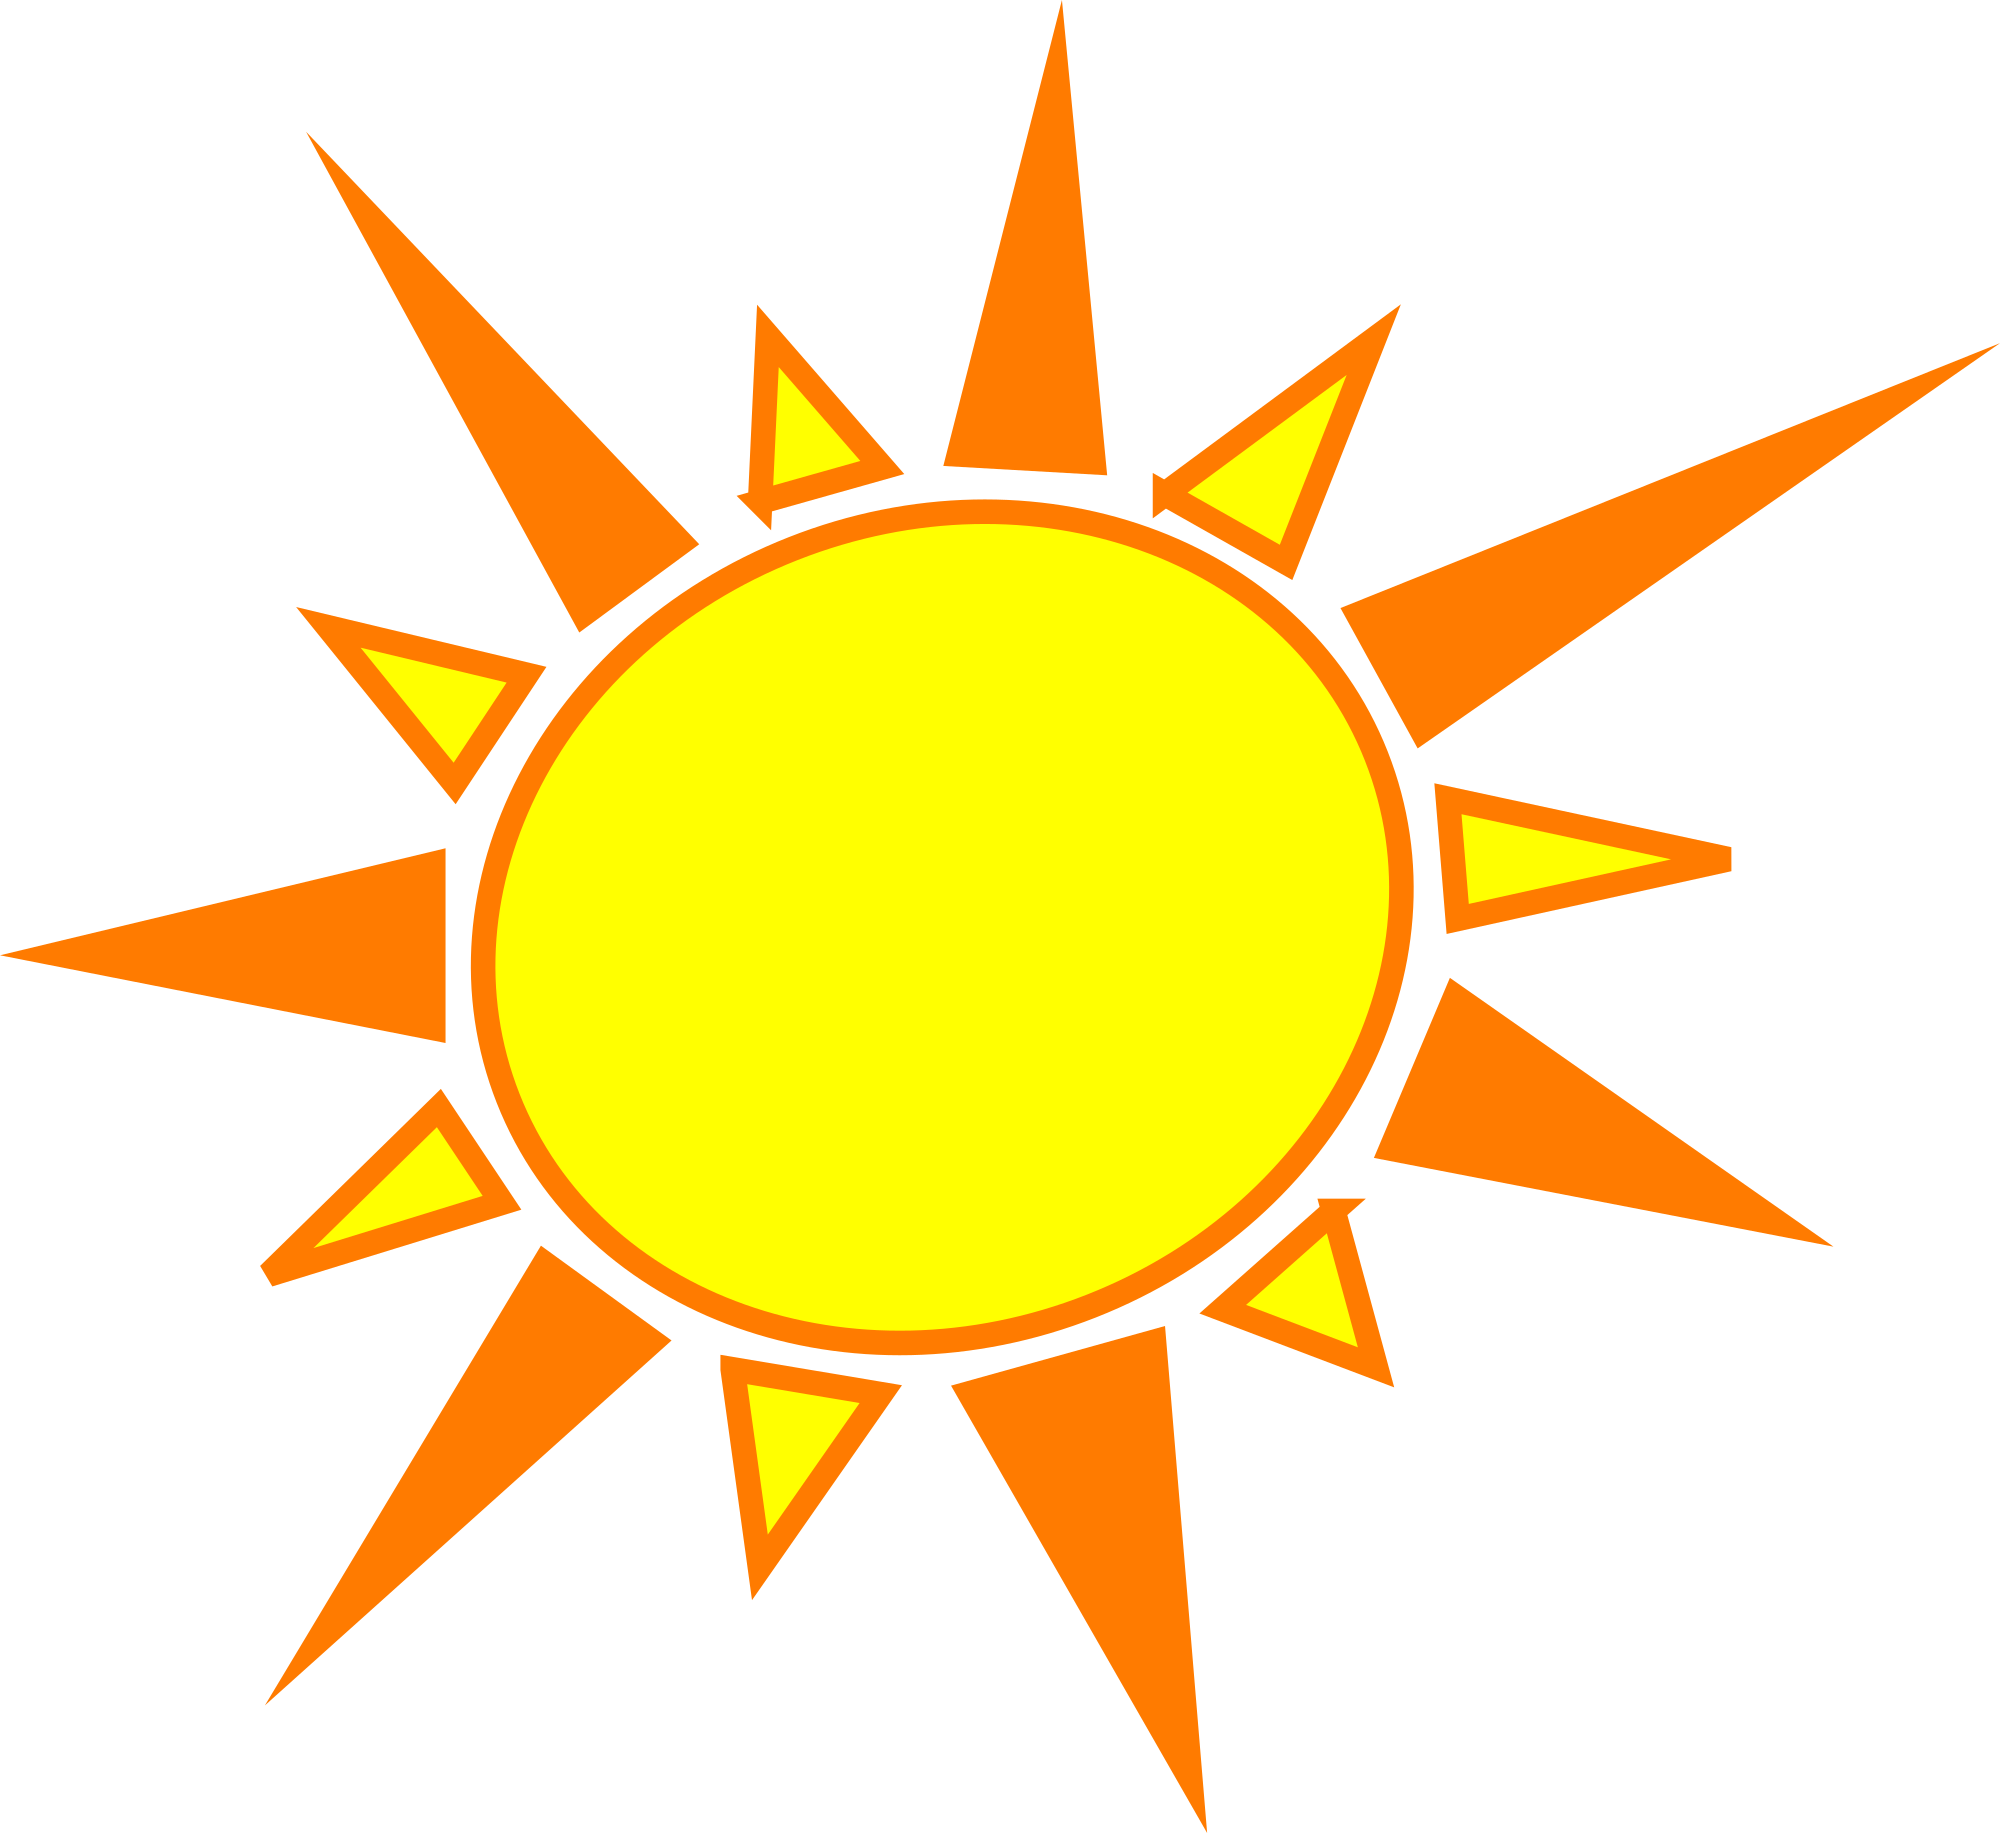 2000x1833 Vibrant Creative Sun Clipart Sunshine Clip Art Free Images 6